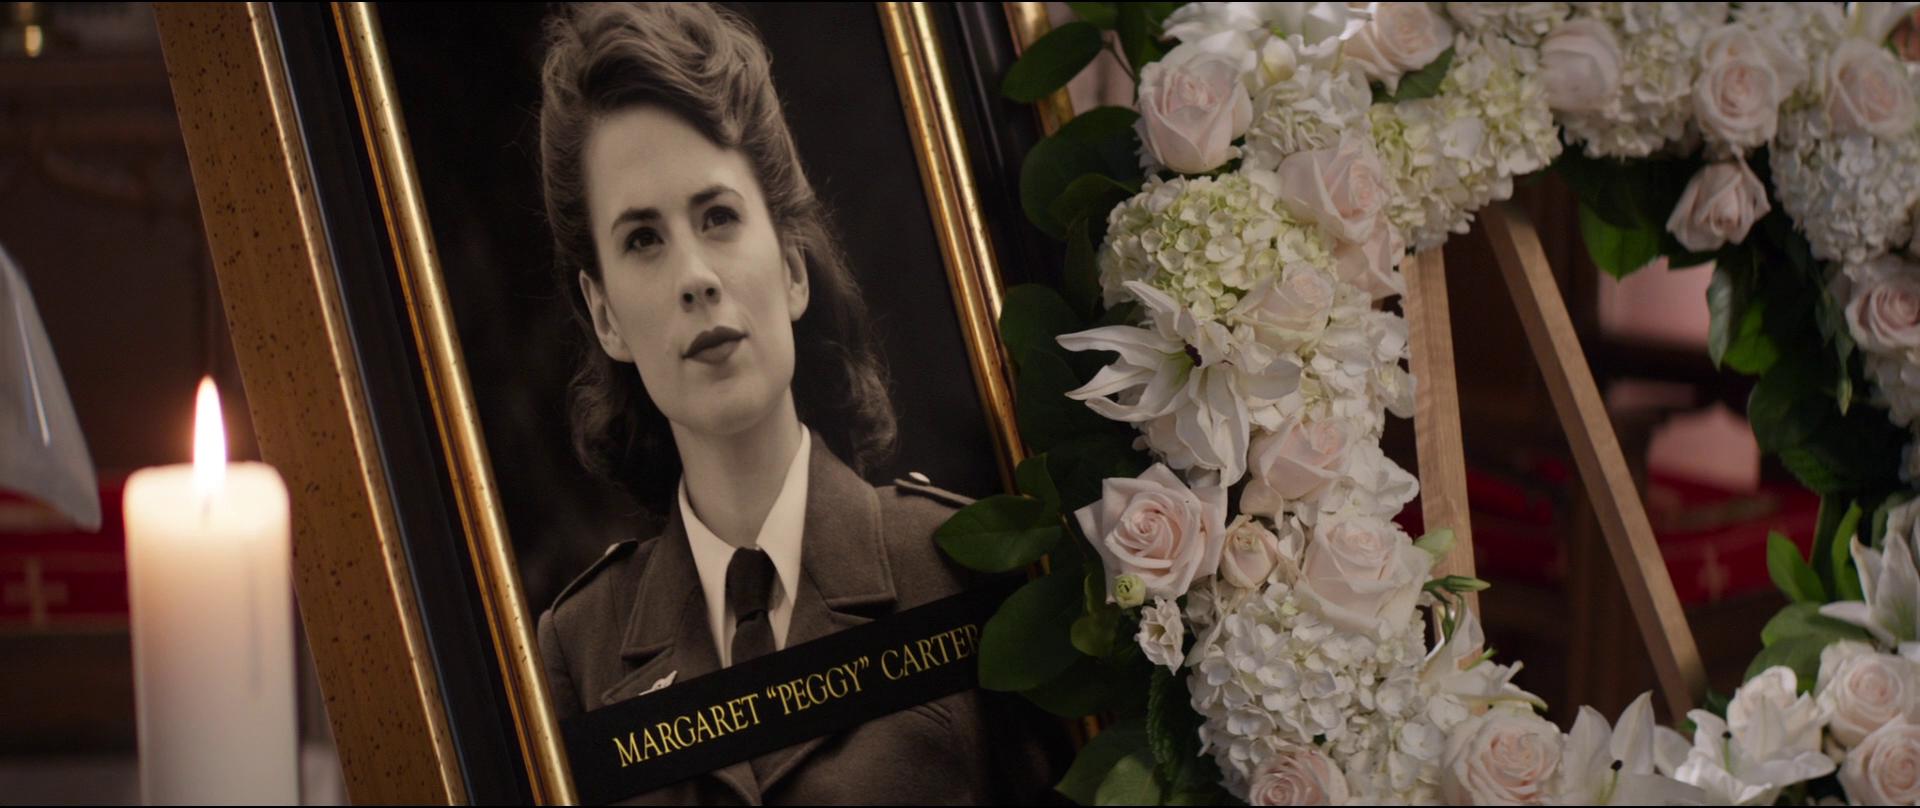 Margaret_'Peggy'_Carter_-_Funeral_Memorial_Photo.png